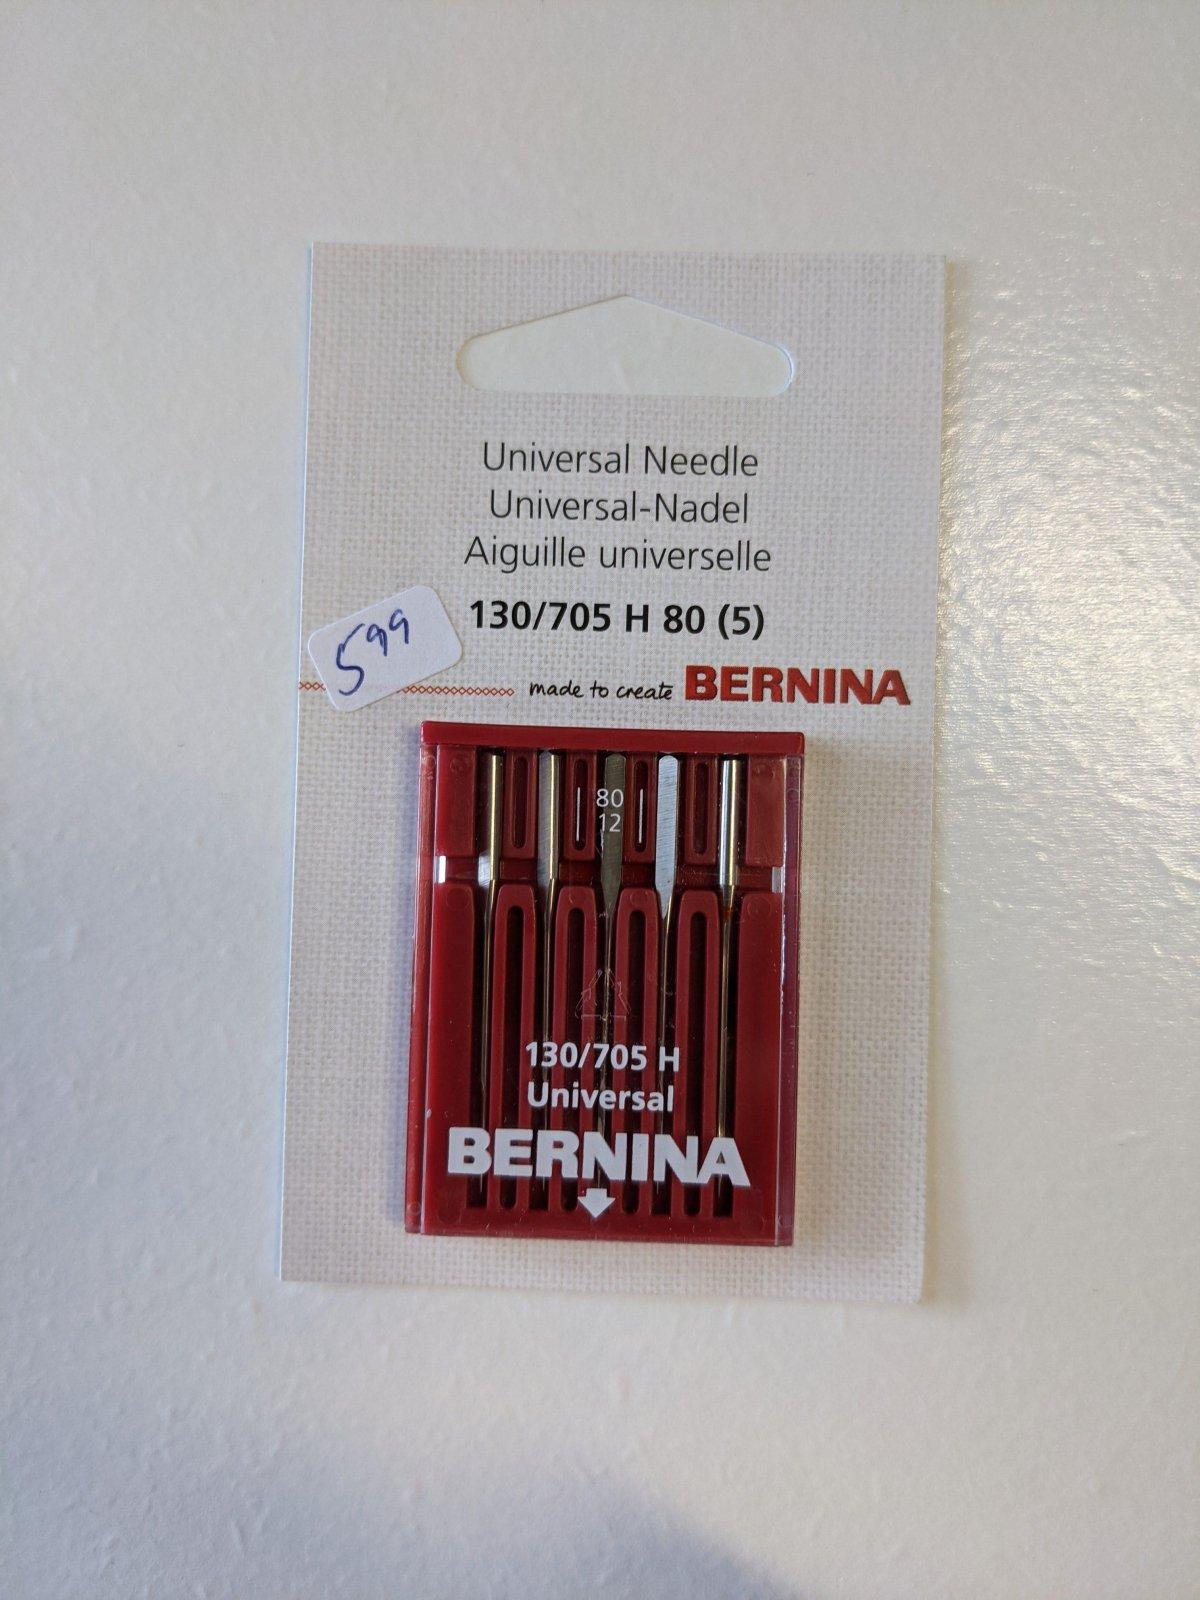 Bernina Universal Needle 130/705 H 80 (5)